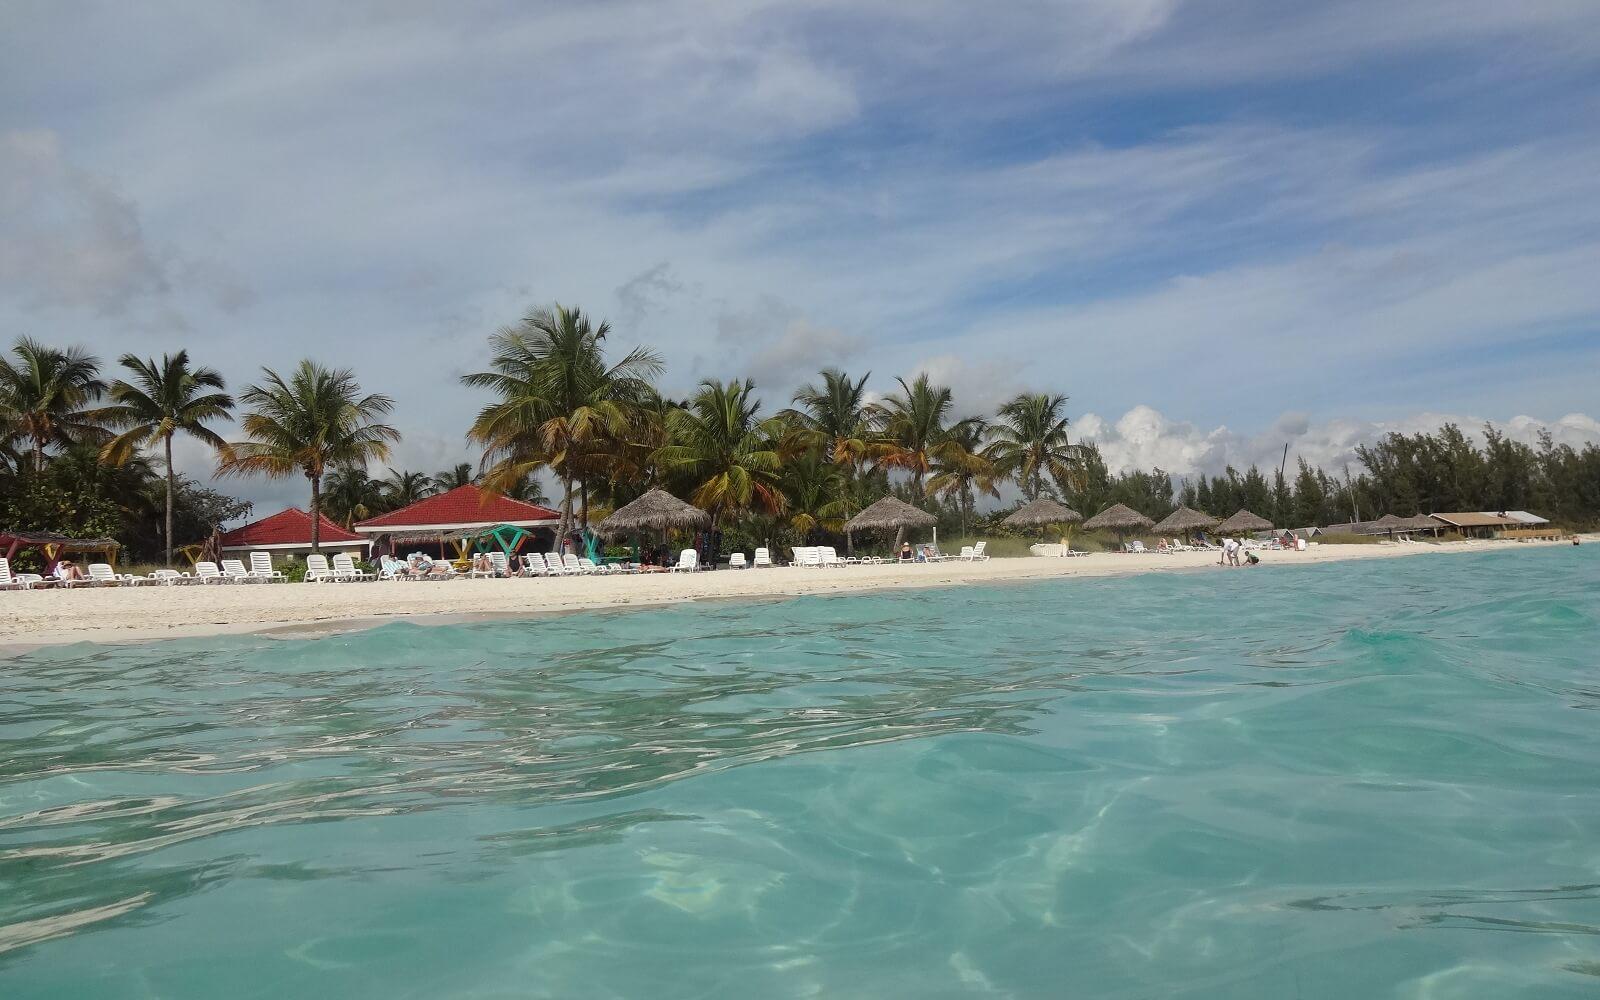 Freiwilligenarbeit USA: Bahamas' traumhafte Strände